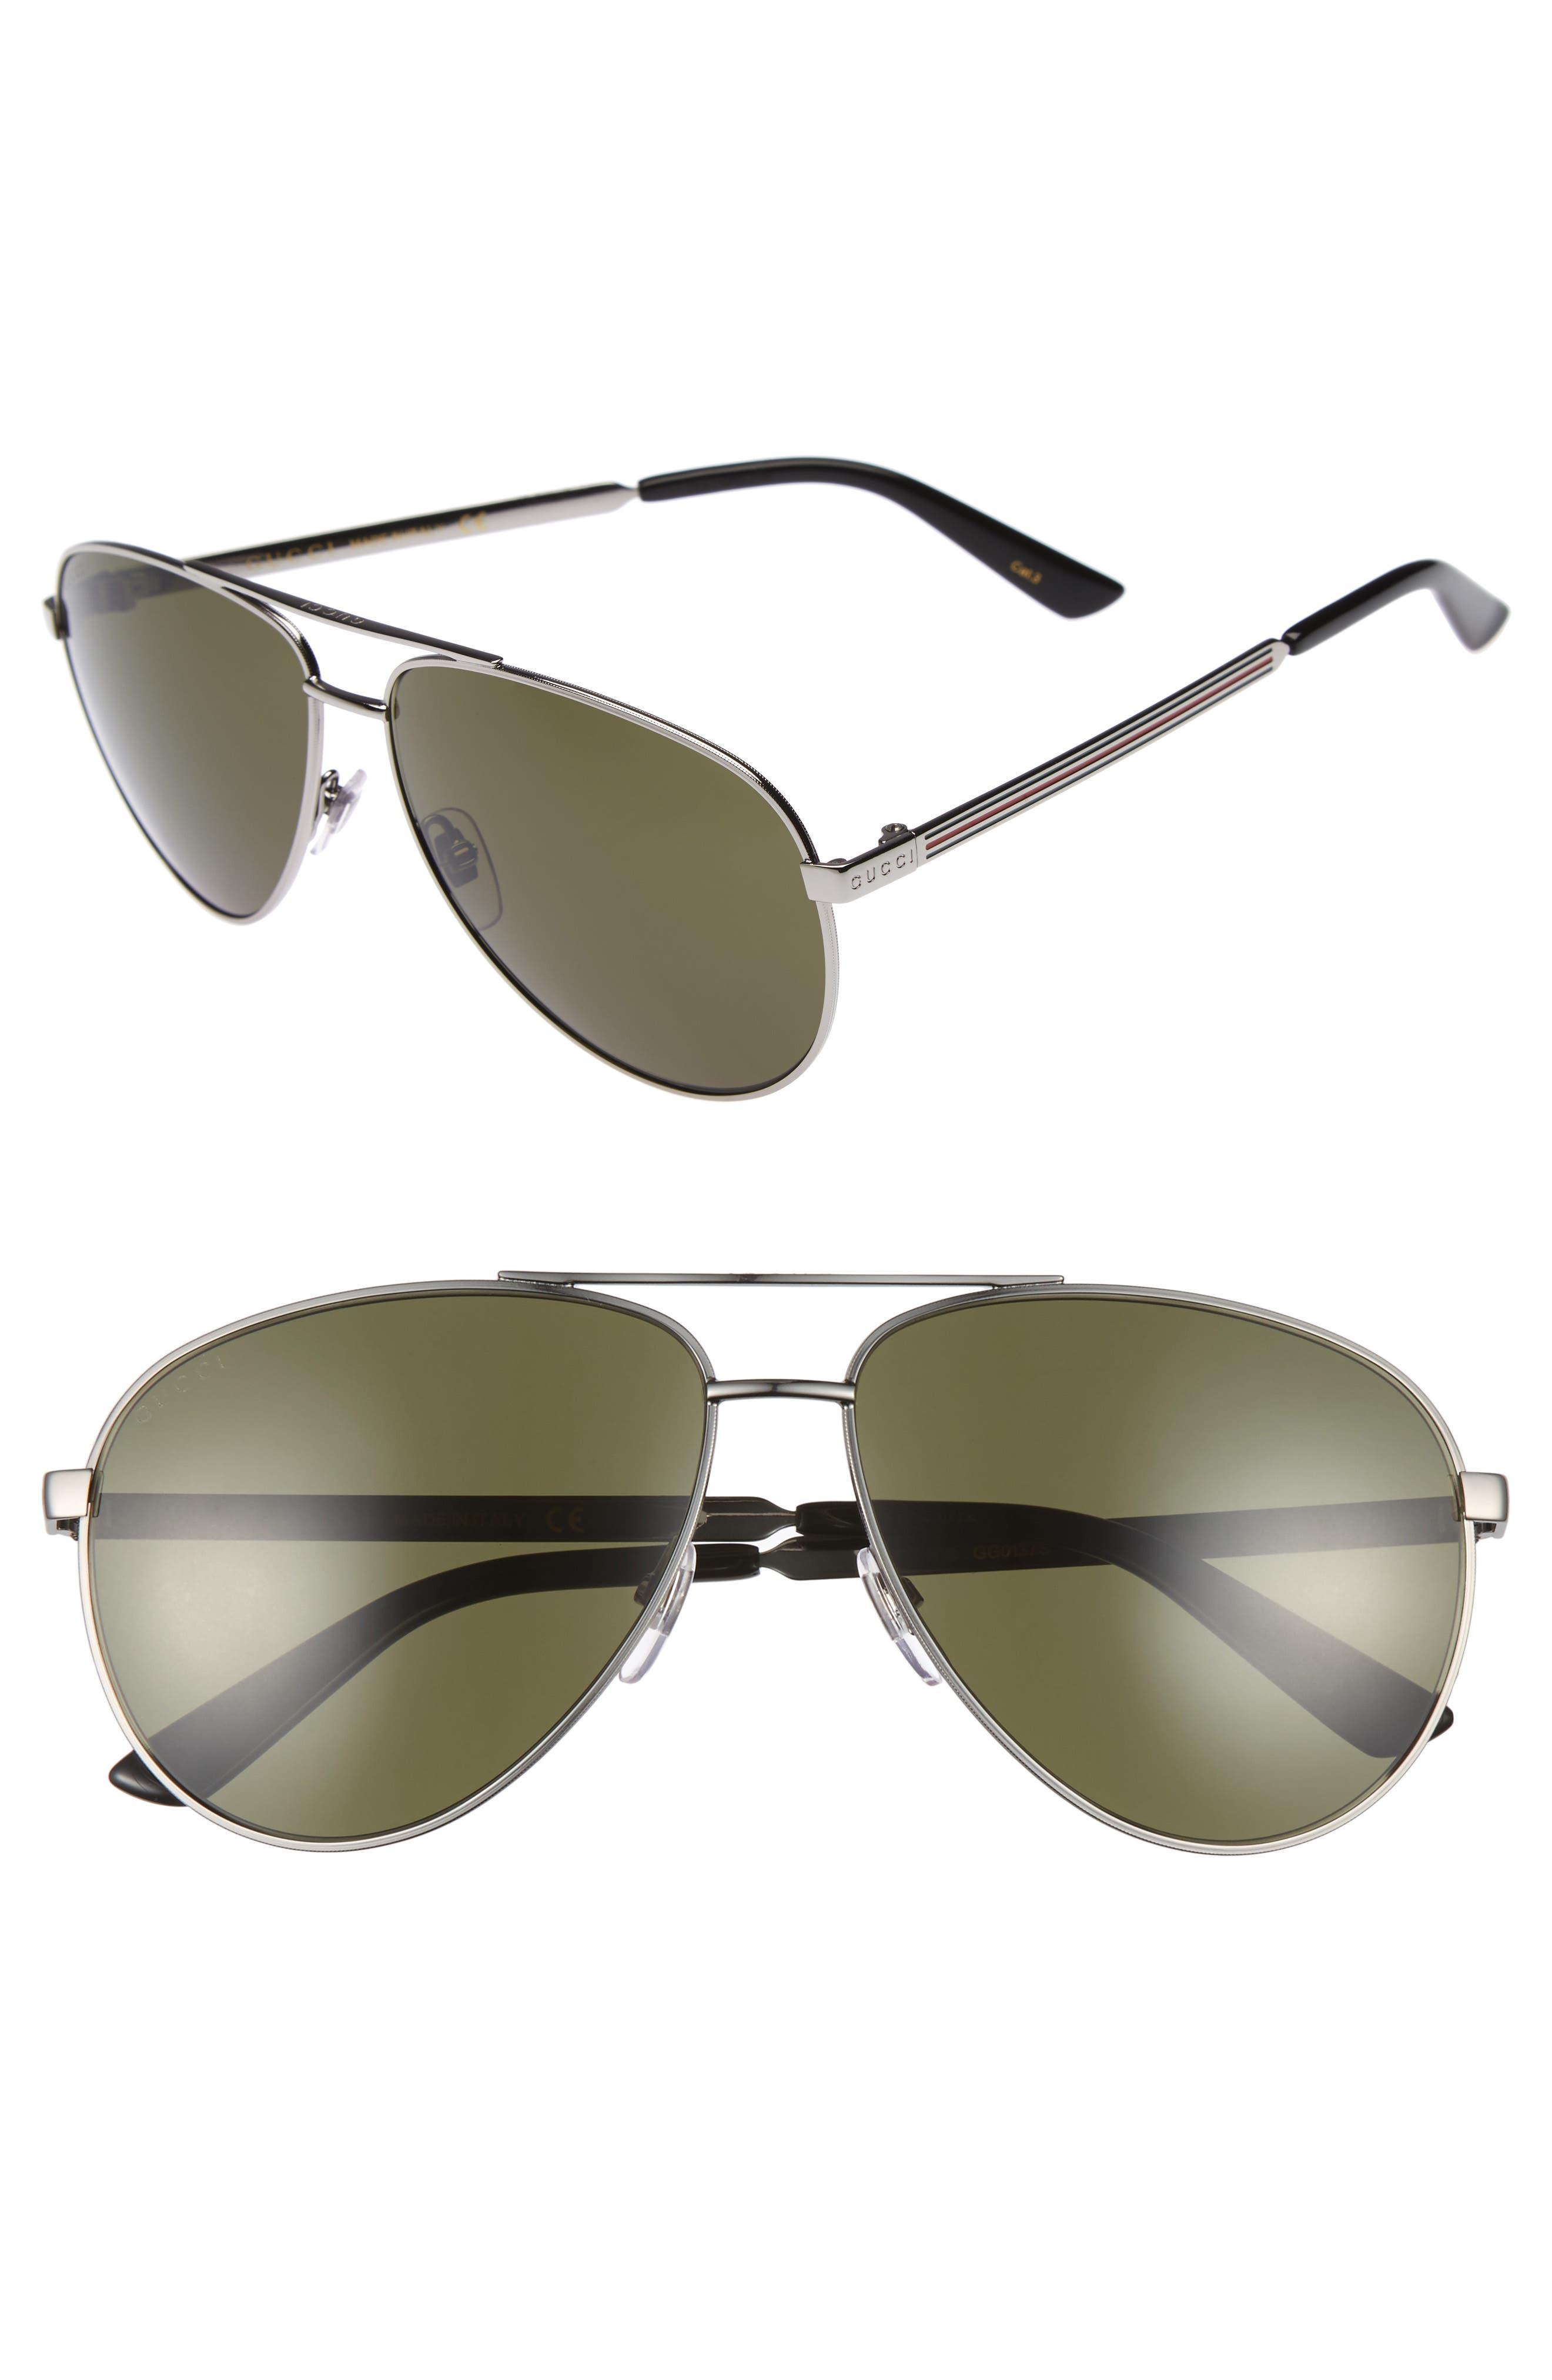 GUCCI, 61mm Aviator Sunglasses, Main thumbnail 1, color, 042